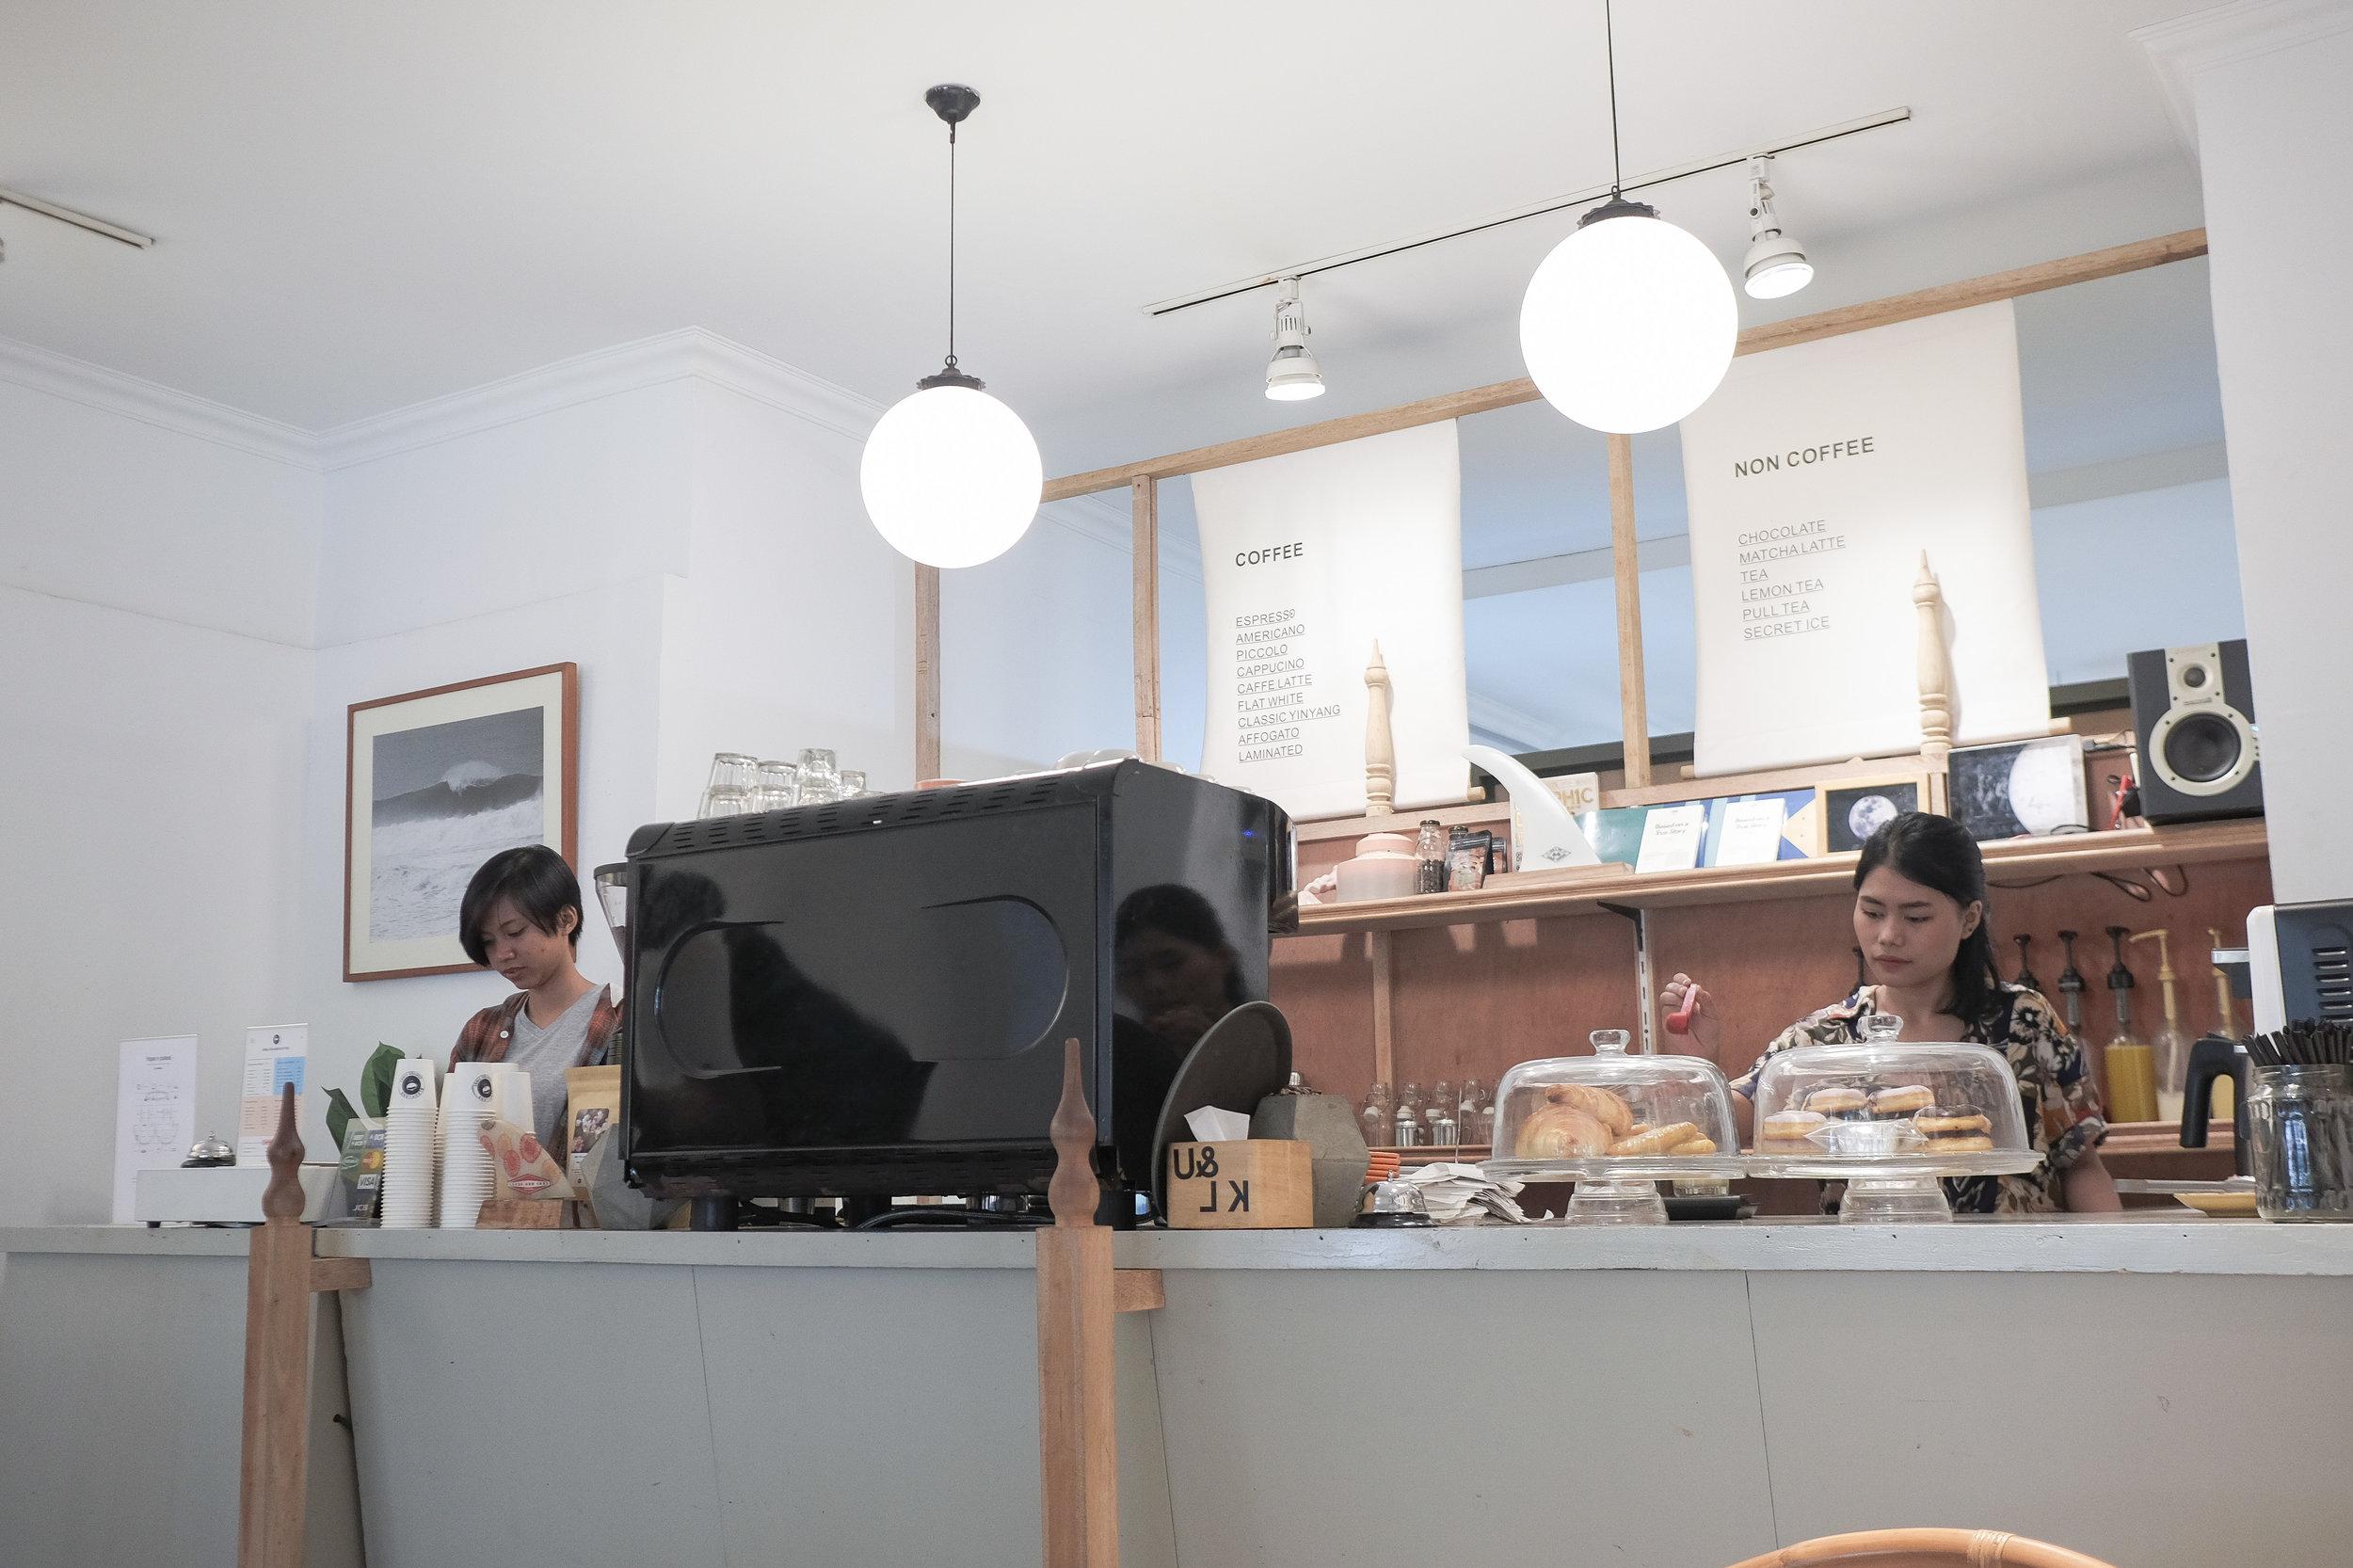 UNKL's cafe